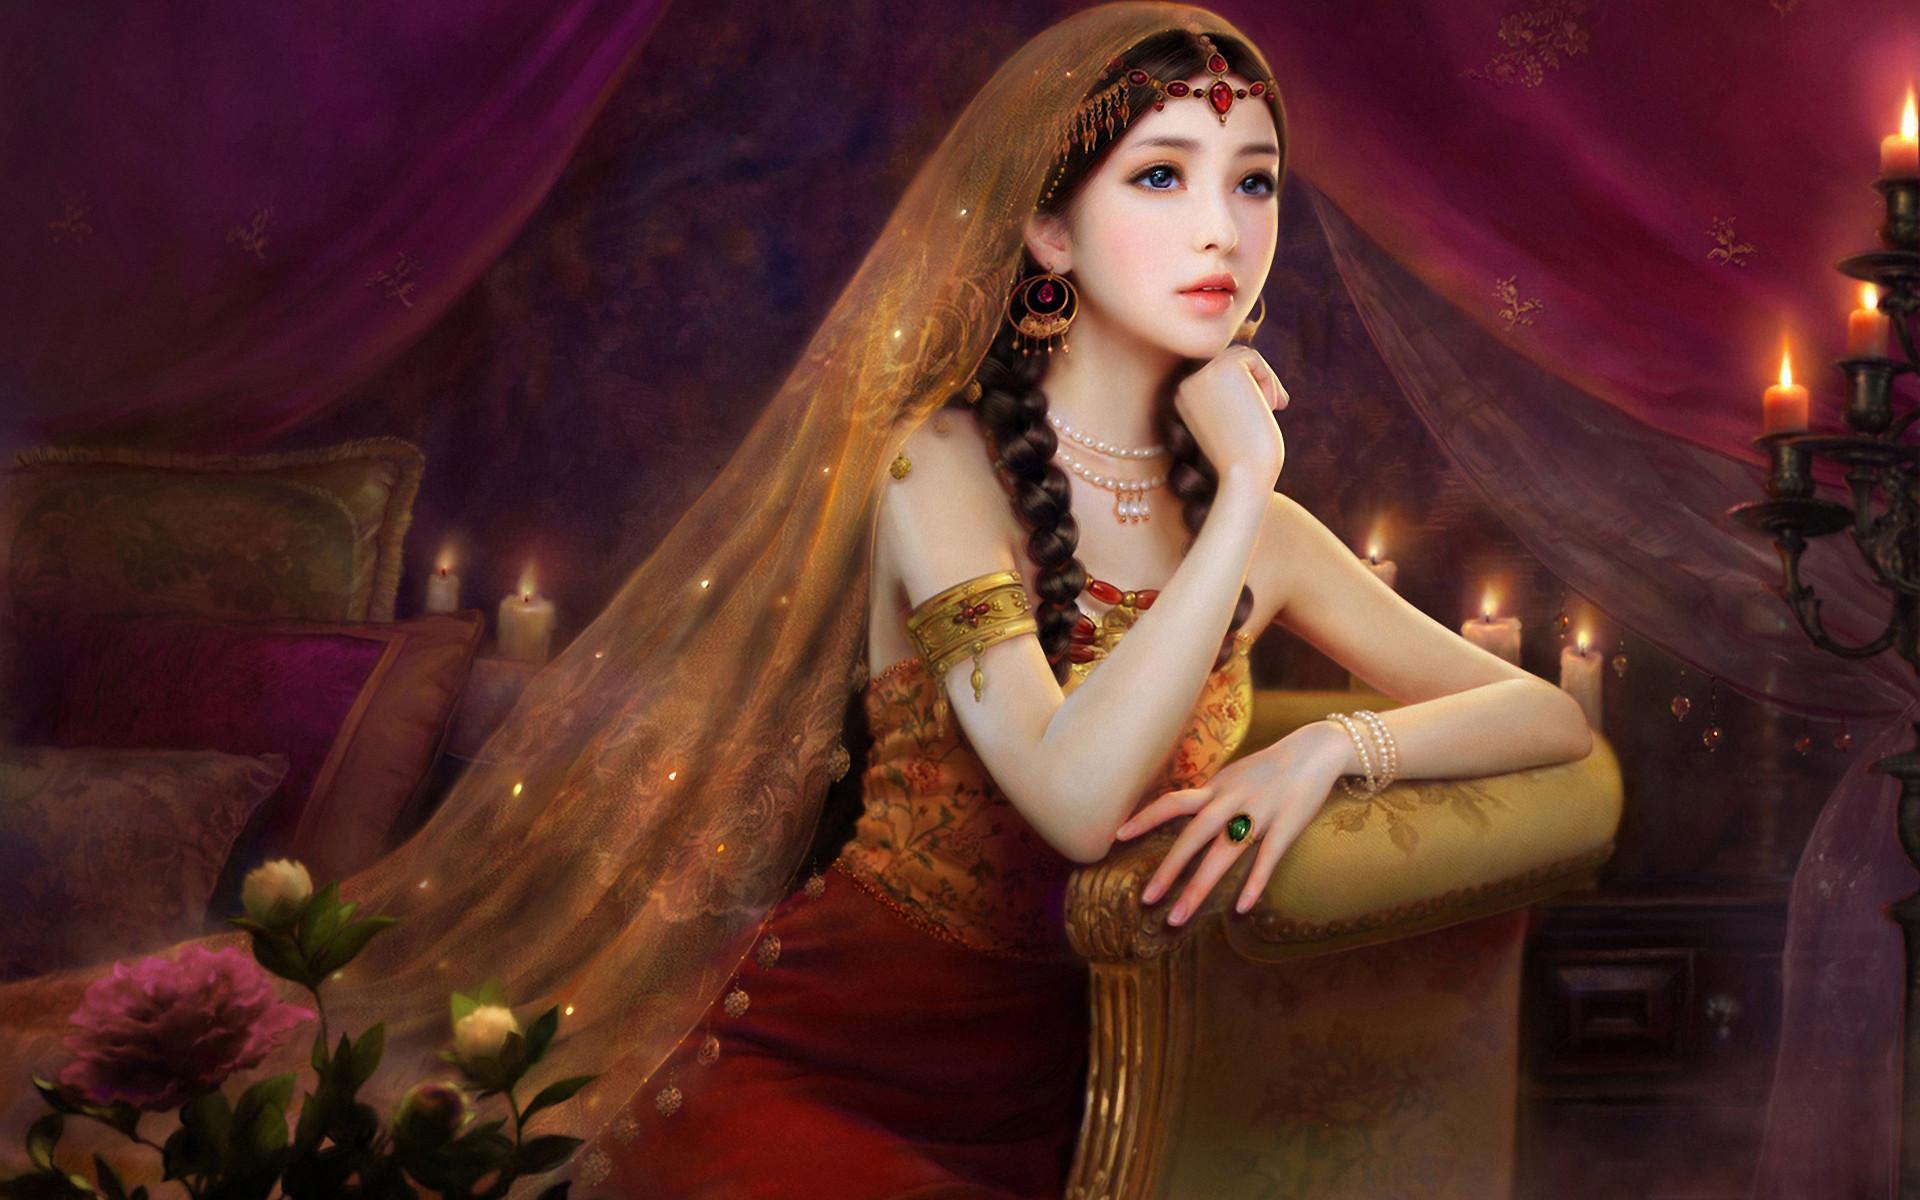 Beautiful Fantasy Women Art